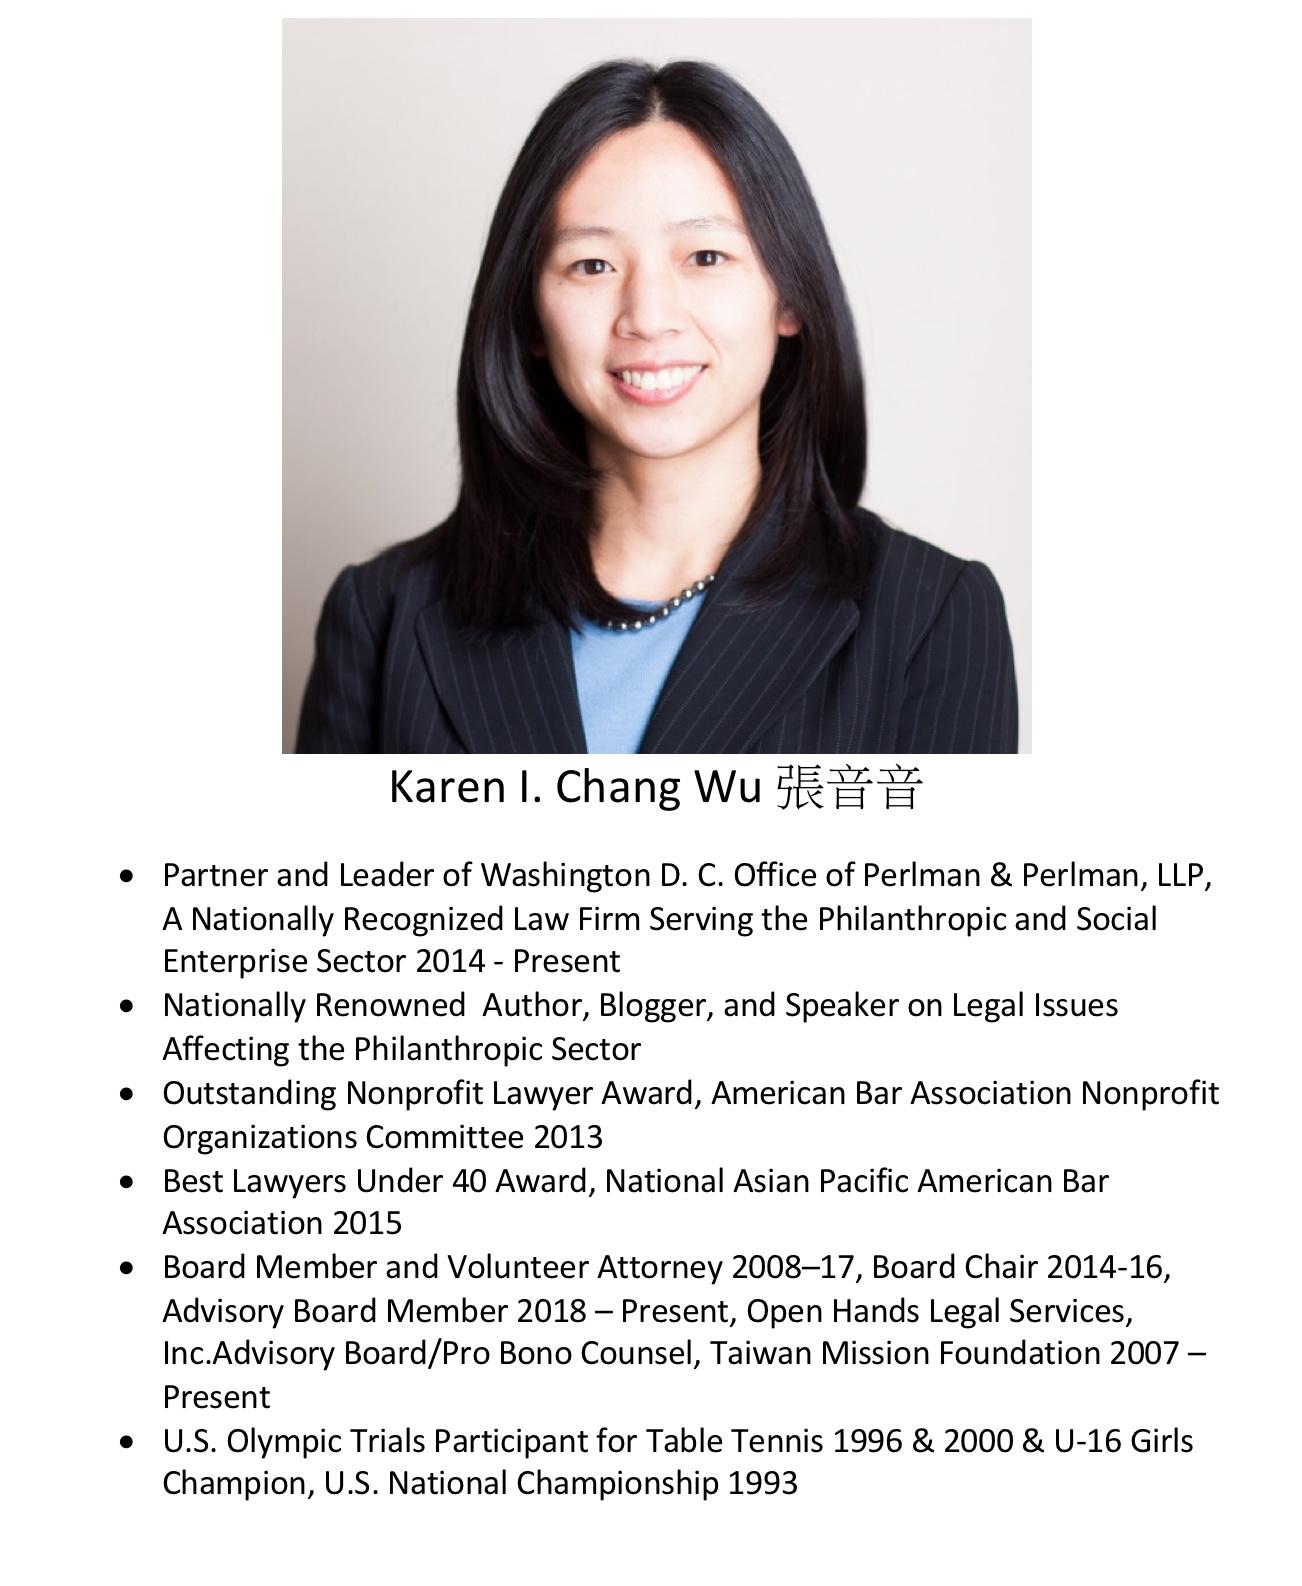 223. Karen I. Chang Wu 張音音